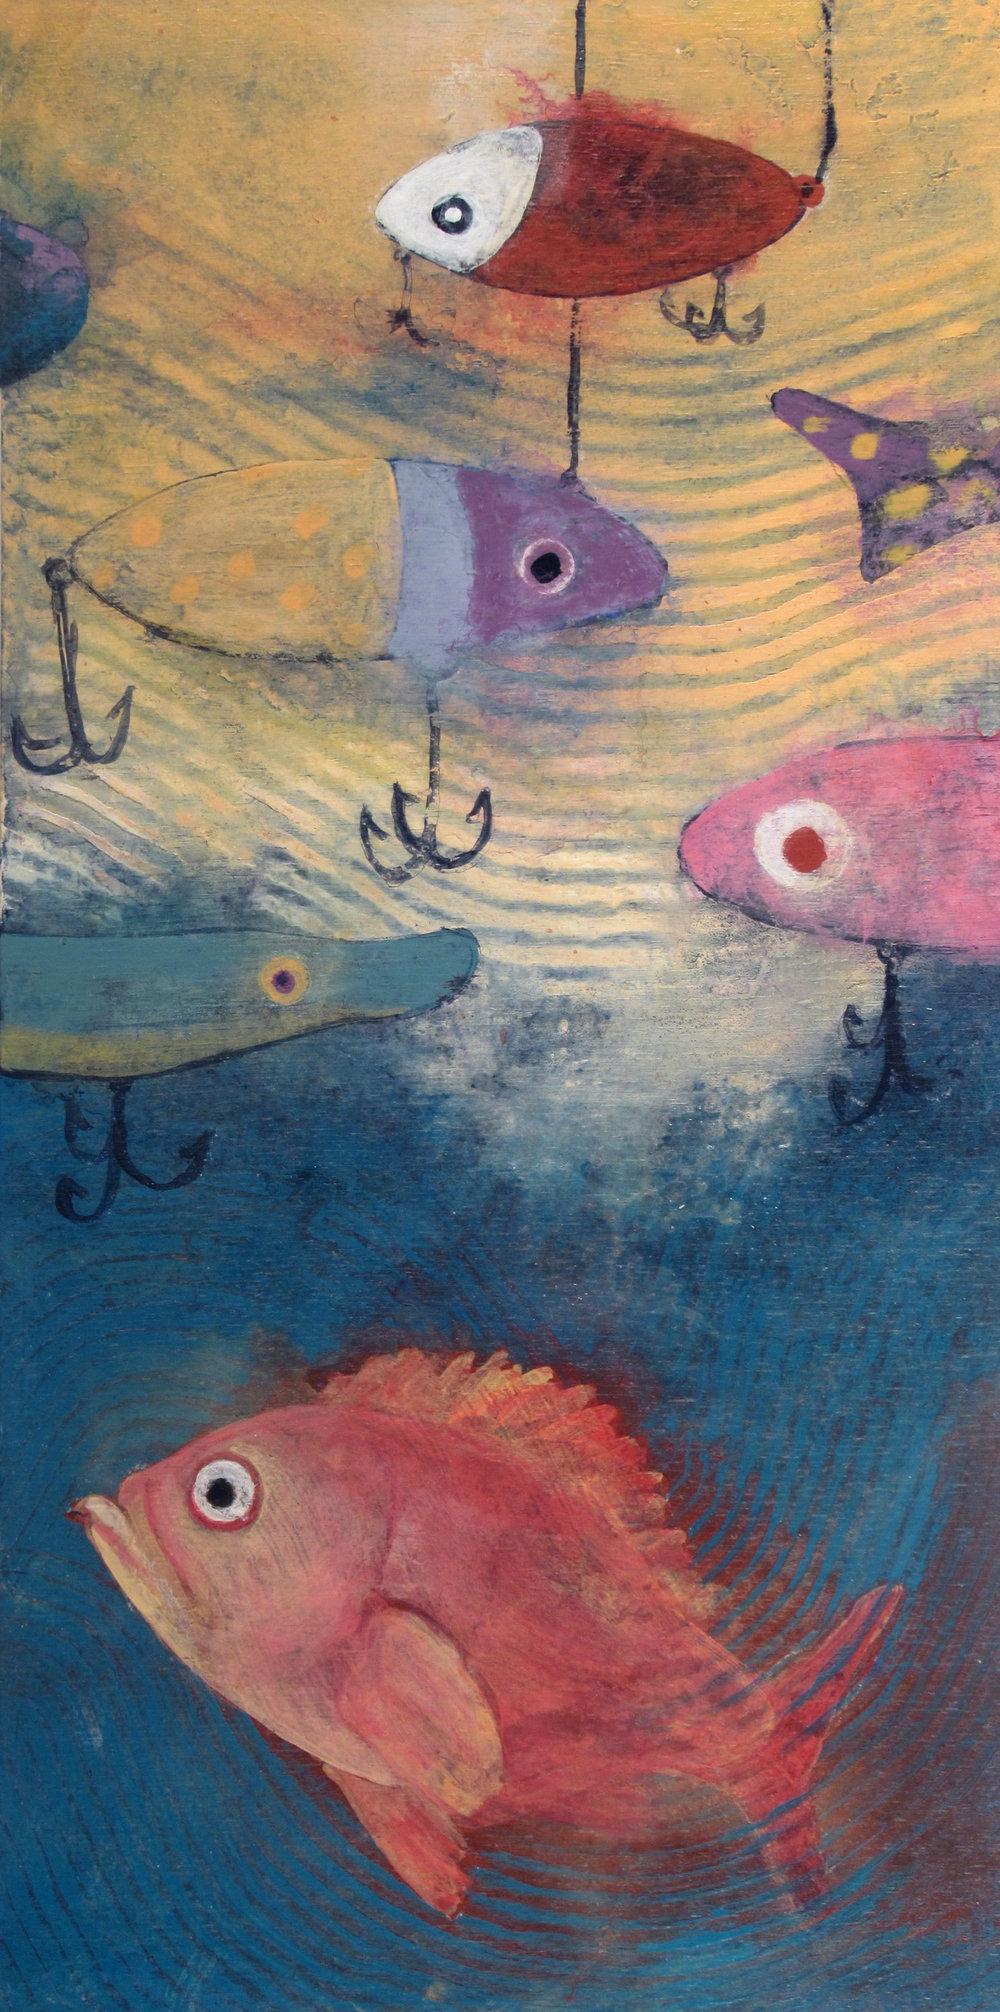 Lure, Lure, Lure - Acadiana Redfish